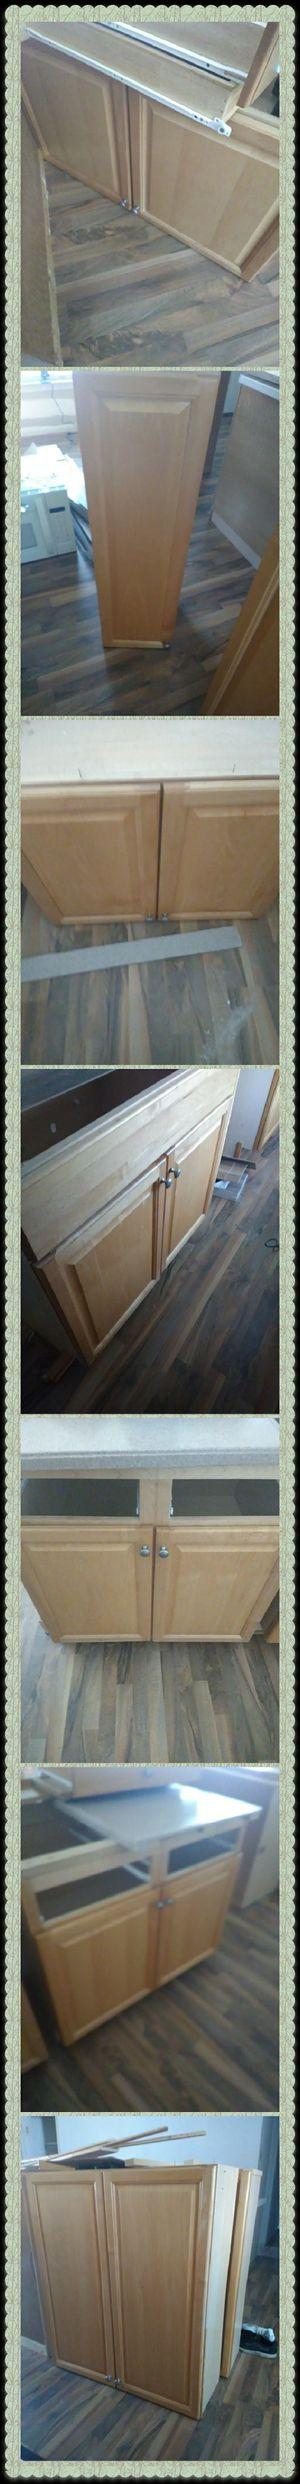 Light oak kitchen cabinets for sale for Sale in Chesapeake, VA